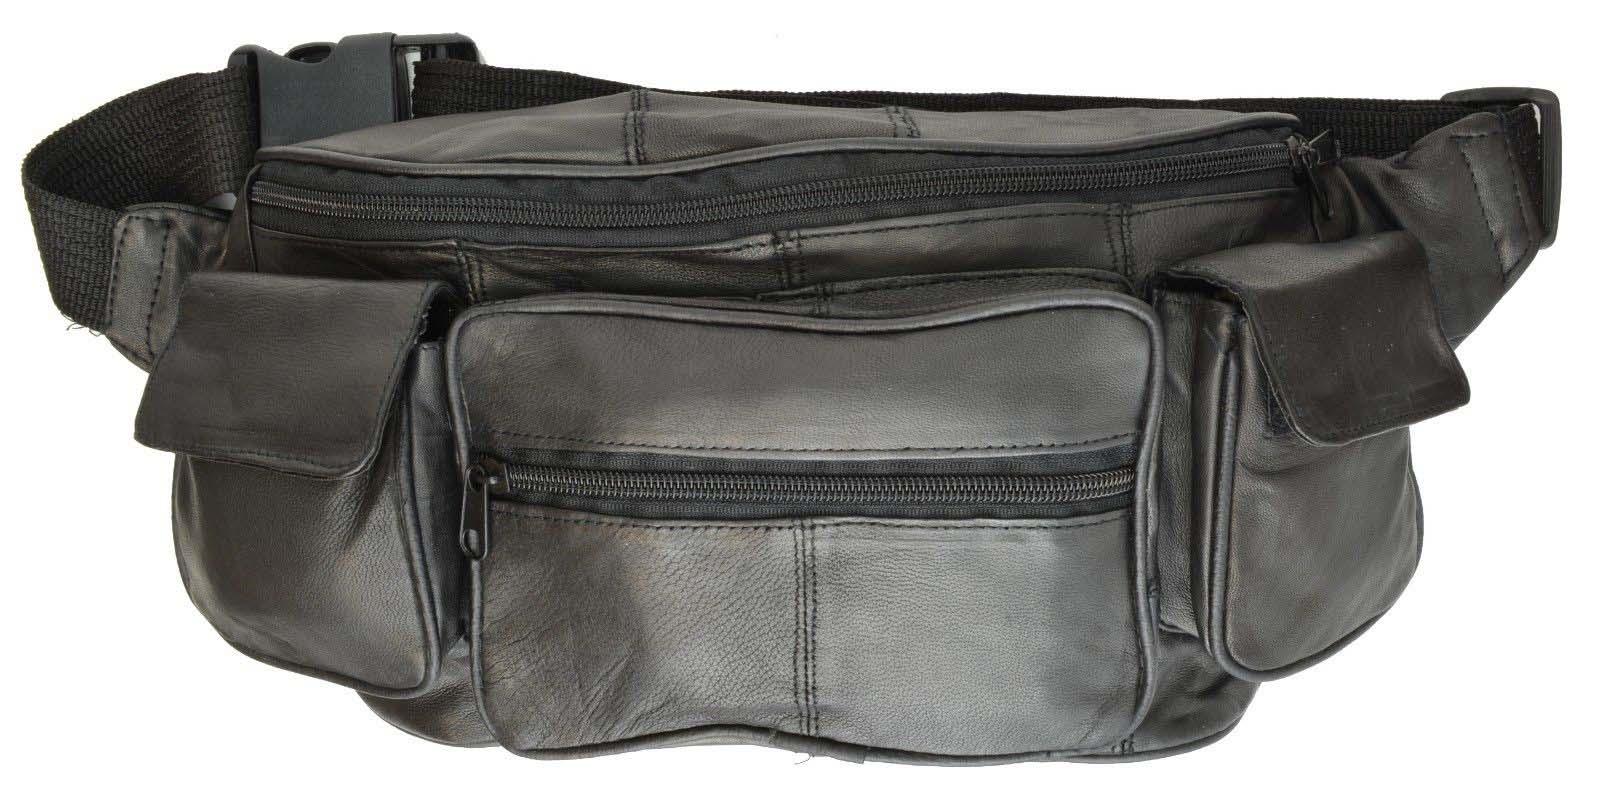 Large Black Solid Leather Waist Fanny Pack Belt Bag Travel Hip Purse Mens Womens